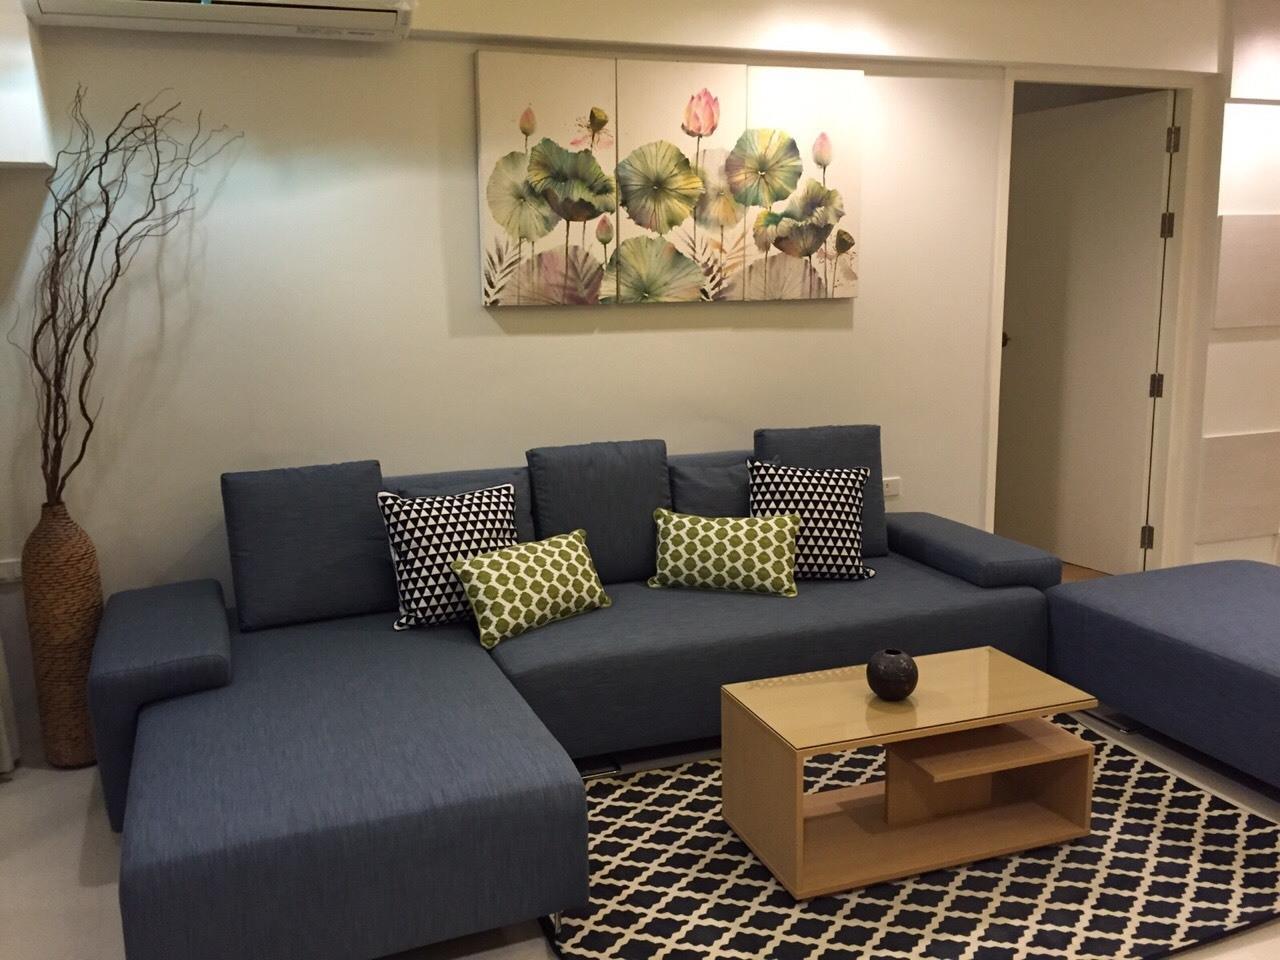 Blueocean property Agency's Condo For Rent – Sunshine Beach Condotel Pattaya 12